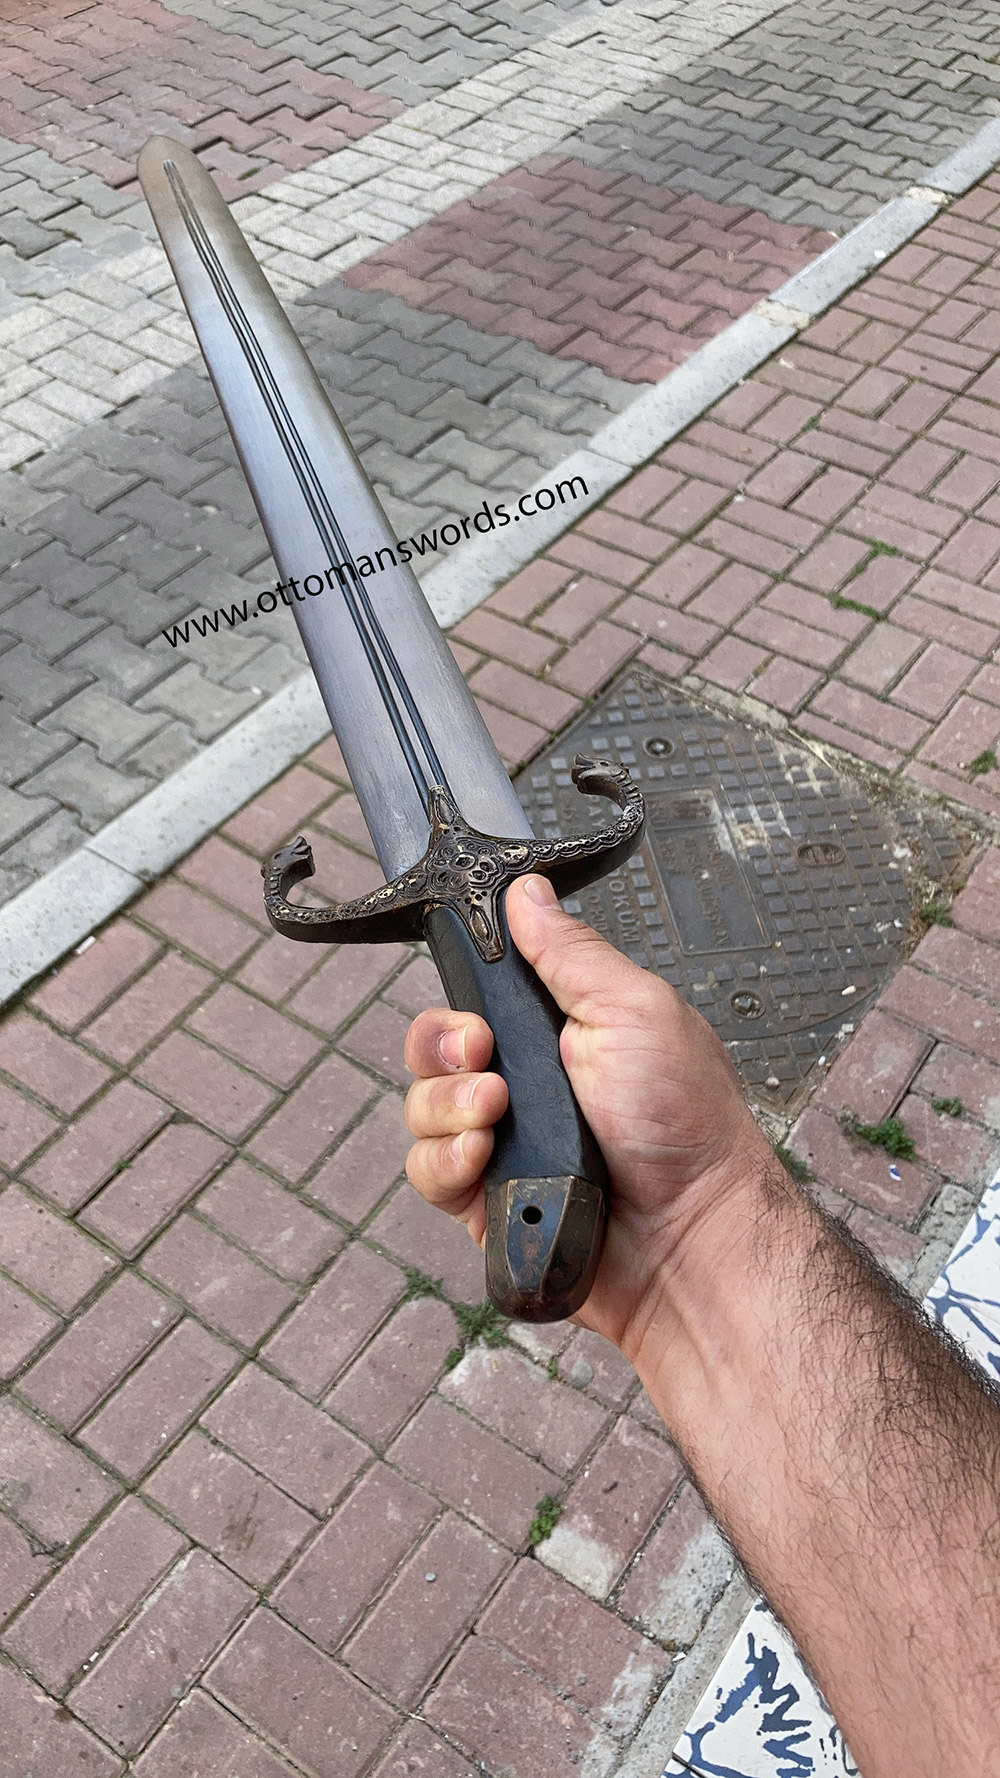 Buy Sword Of Caliph Abu Bakr 3 Sword Of Abu Bakr Al Siddiq